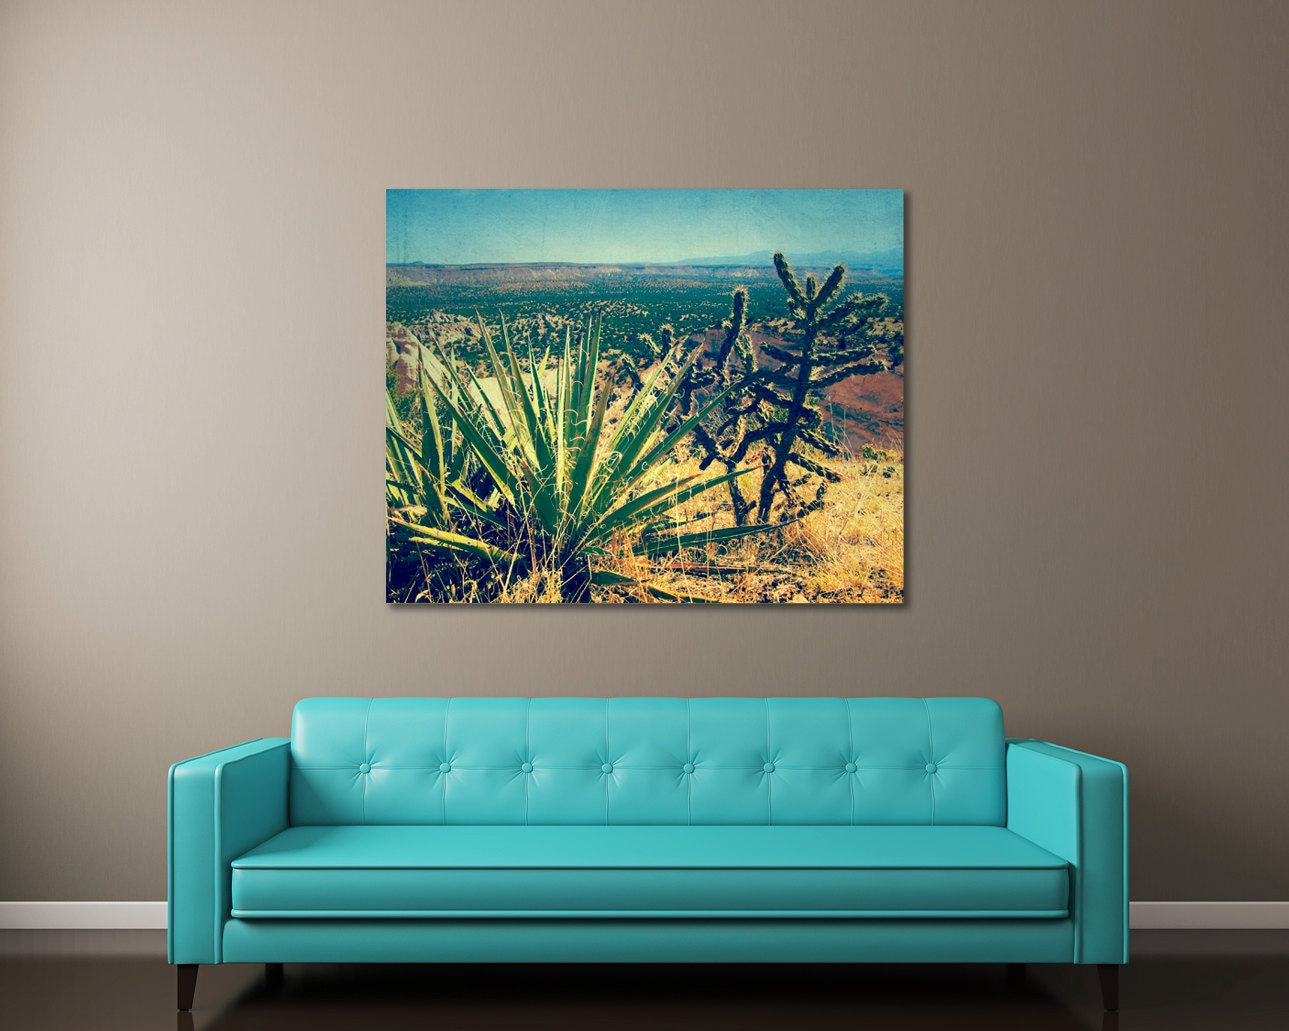 Cactus art southwestern wall art new mexico landscape zoom amipublicfo Choice Image